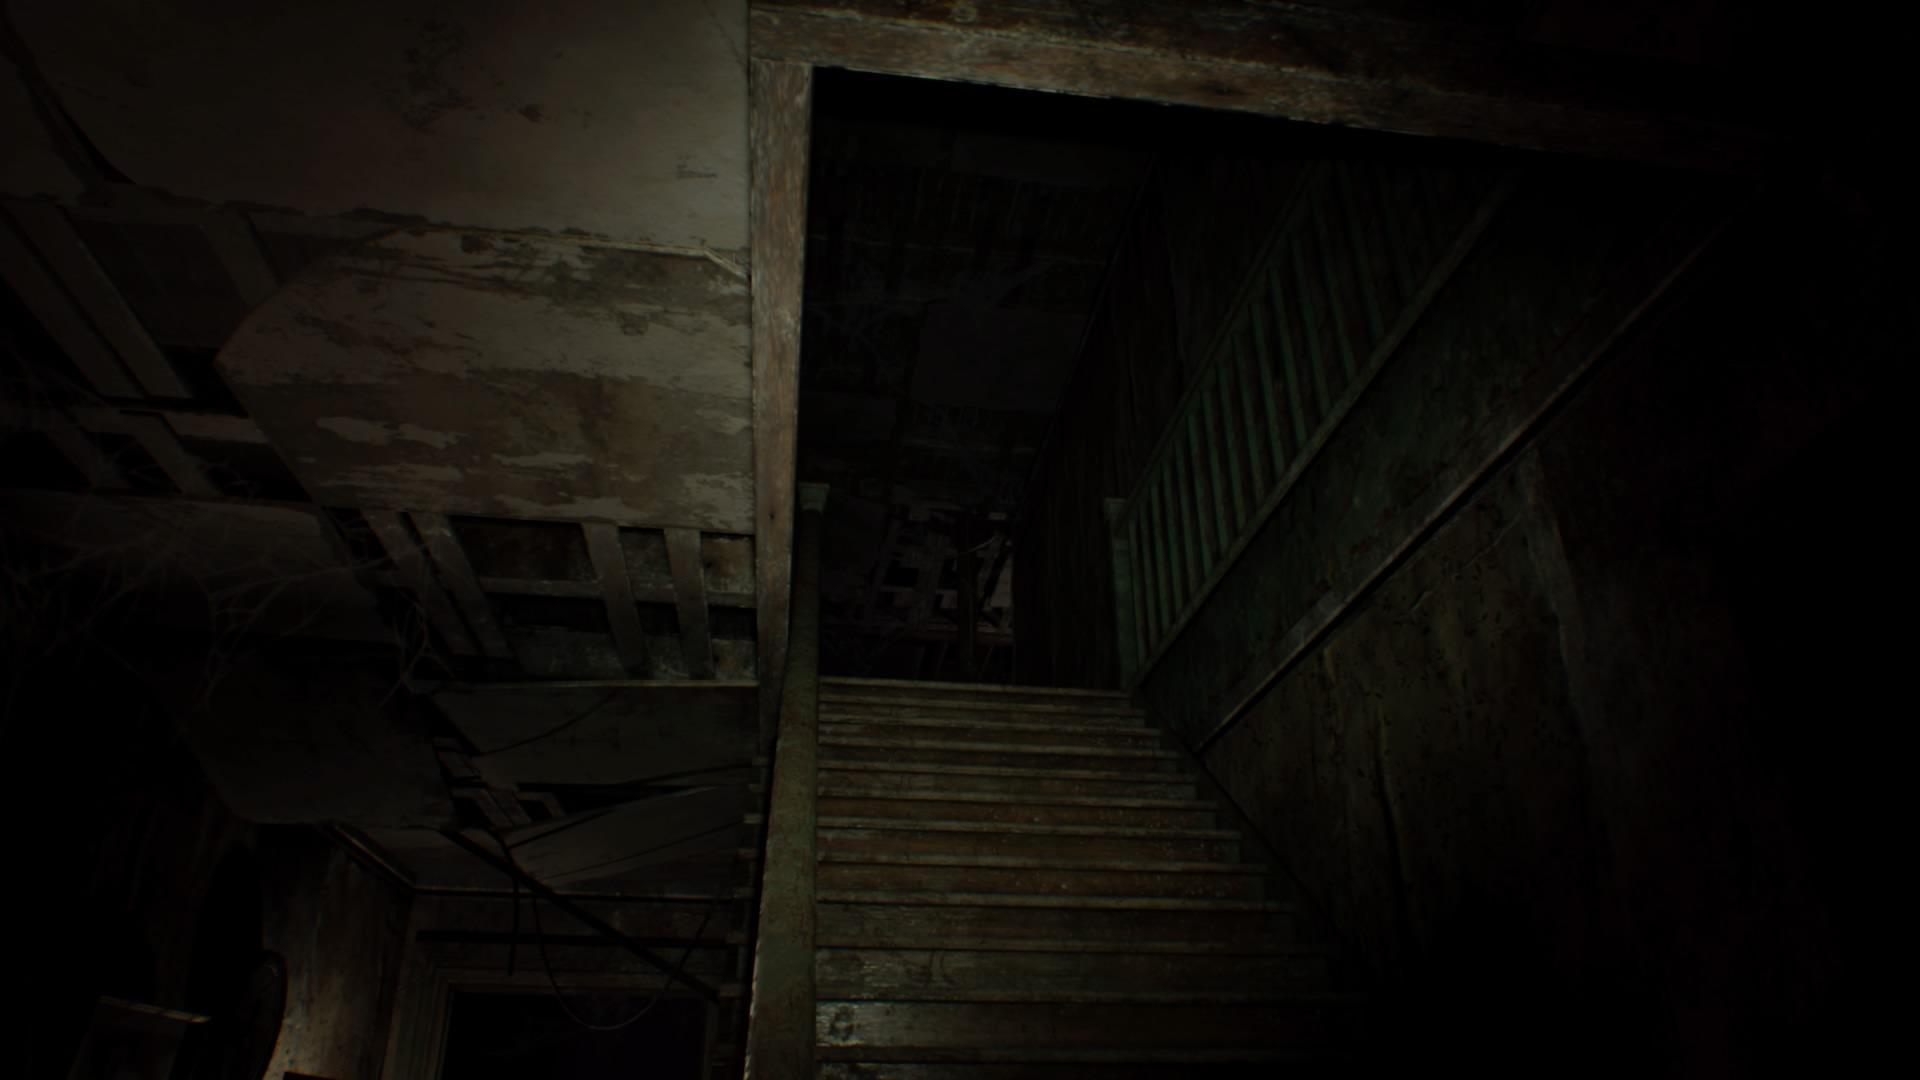 get the basement key